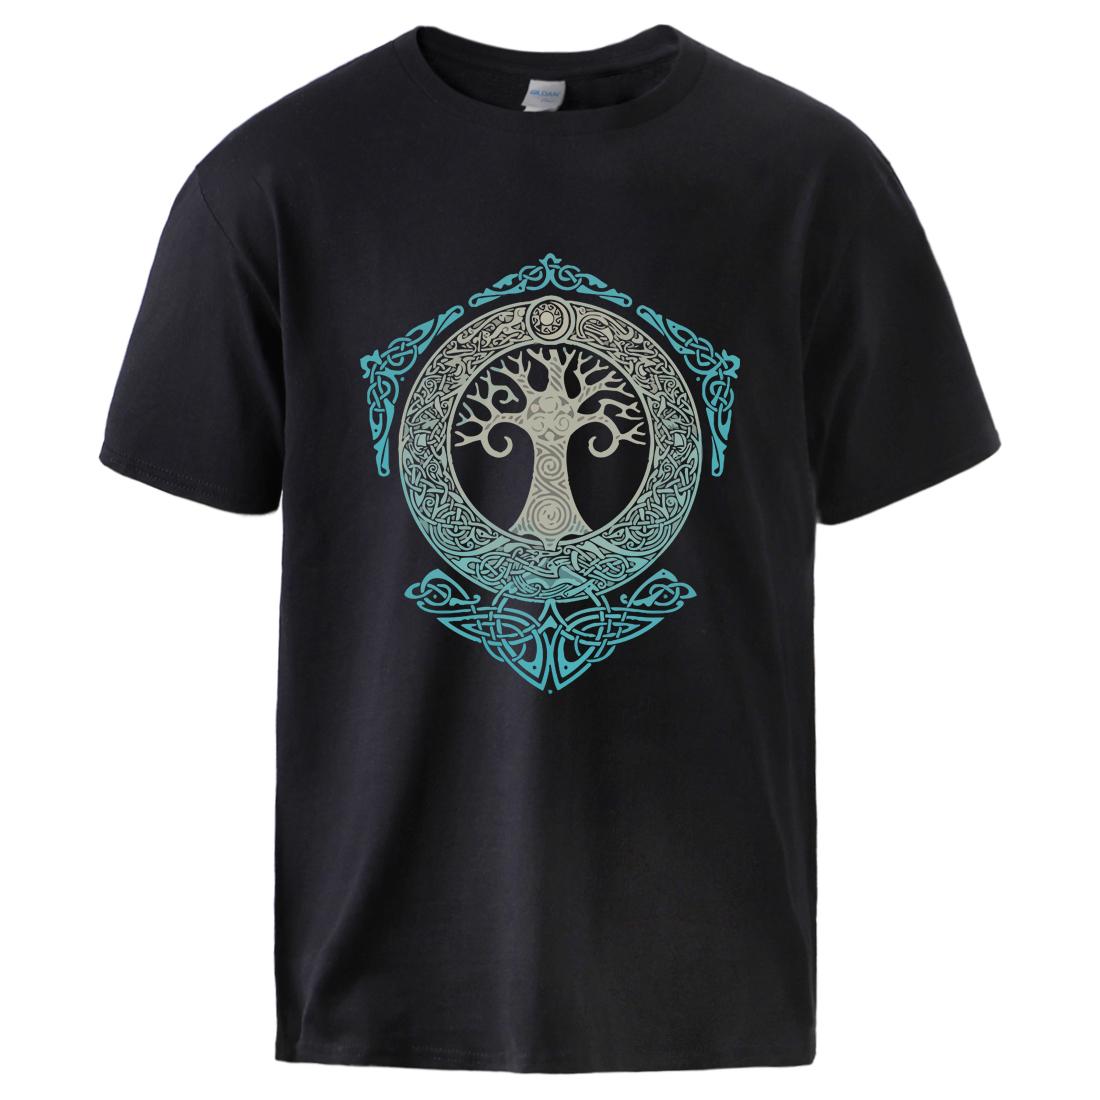 Vikings Tshirts for Man Yggdrasil Norse Mythology Summer Cotton T shirts Tee Male Casual Short Sleeve Crewneck Sportswear Tee